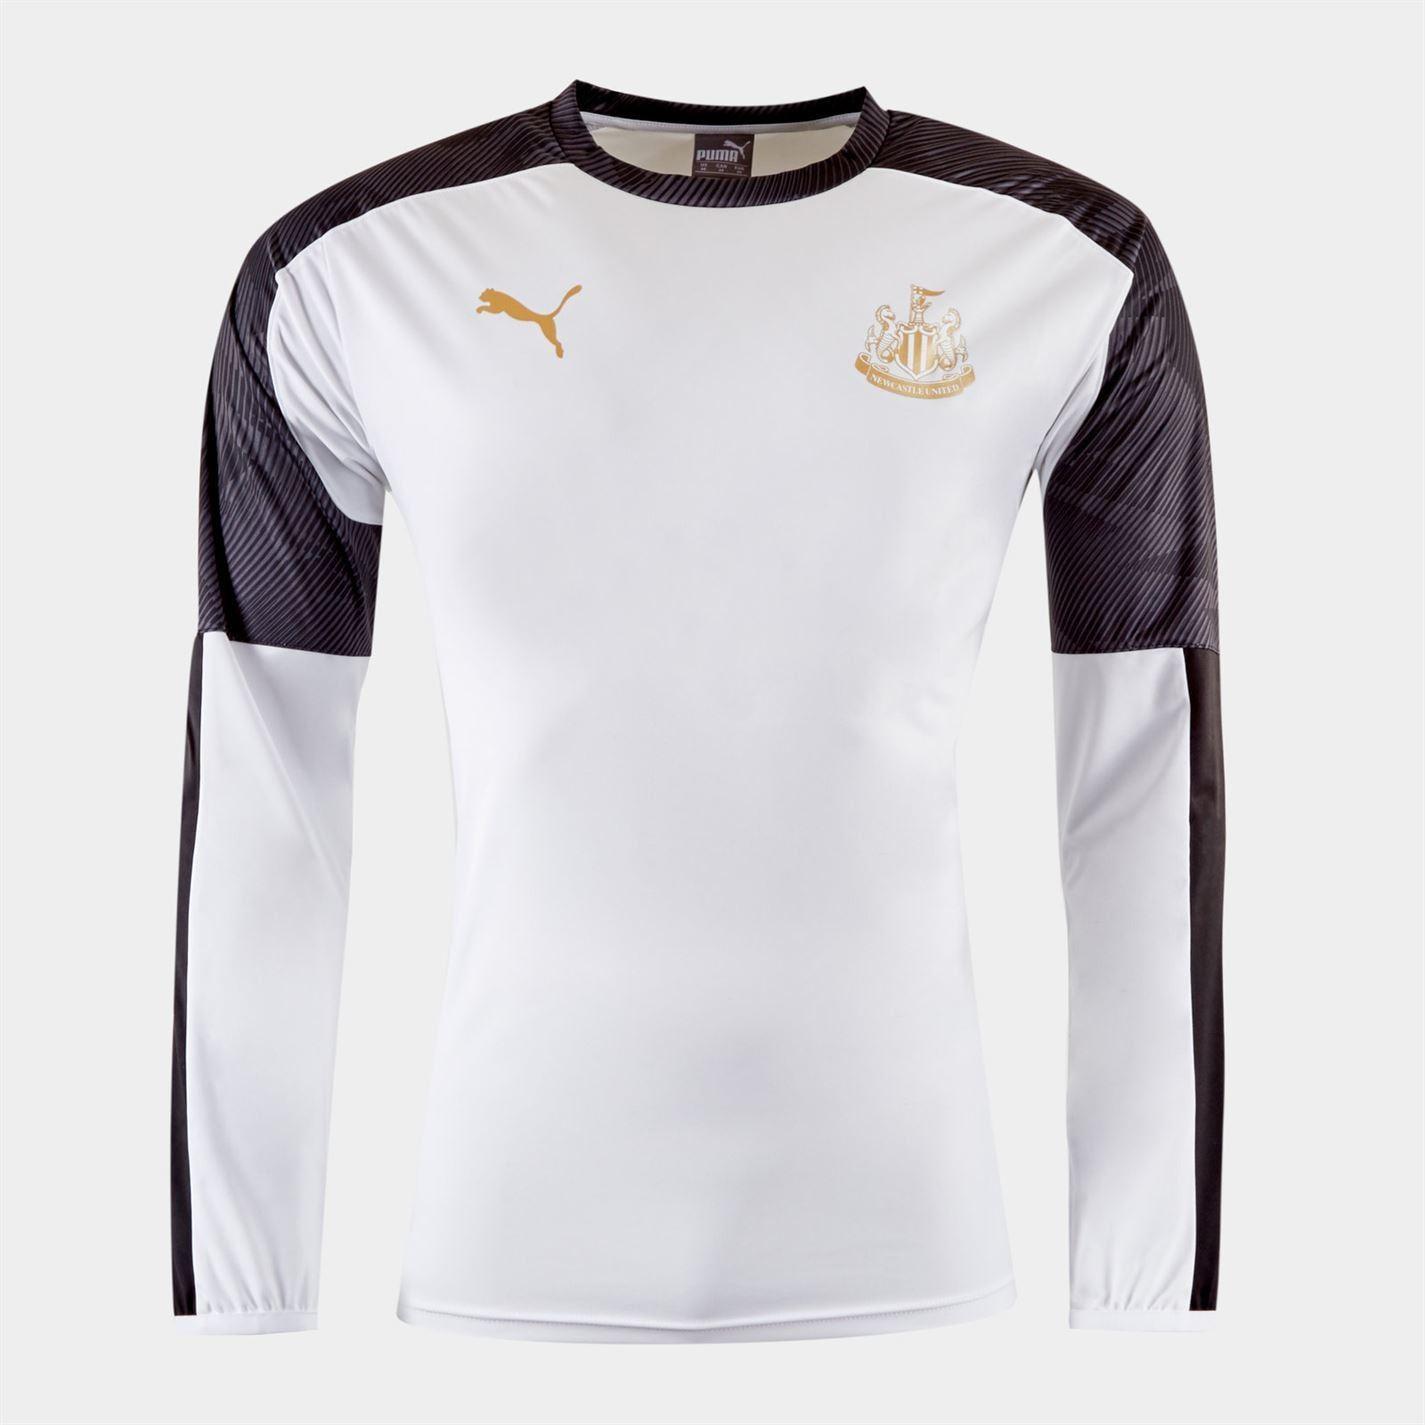 Puma-Newcastle-United-T-Shirt-Junior-Football-Boys-Soccer-Fan-Jersey-Drill-Top thumbnail 6